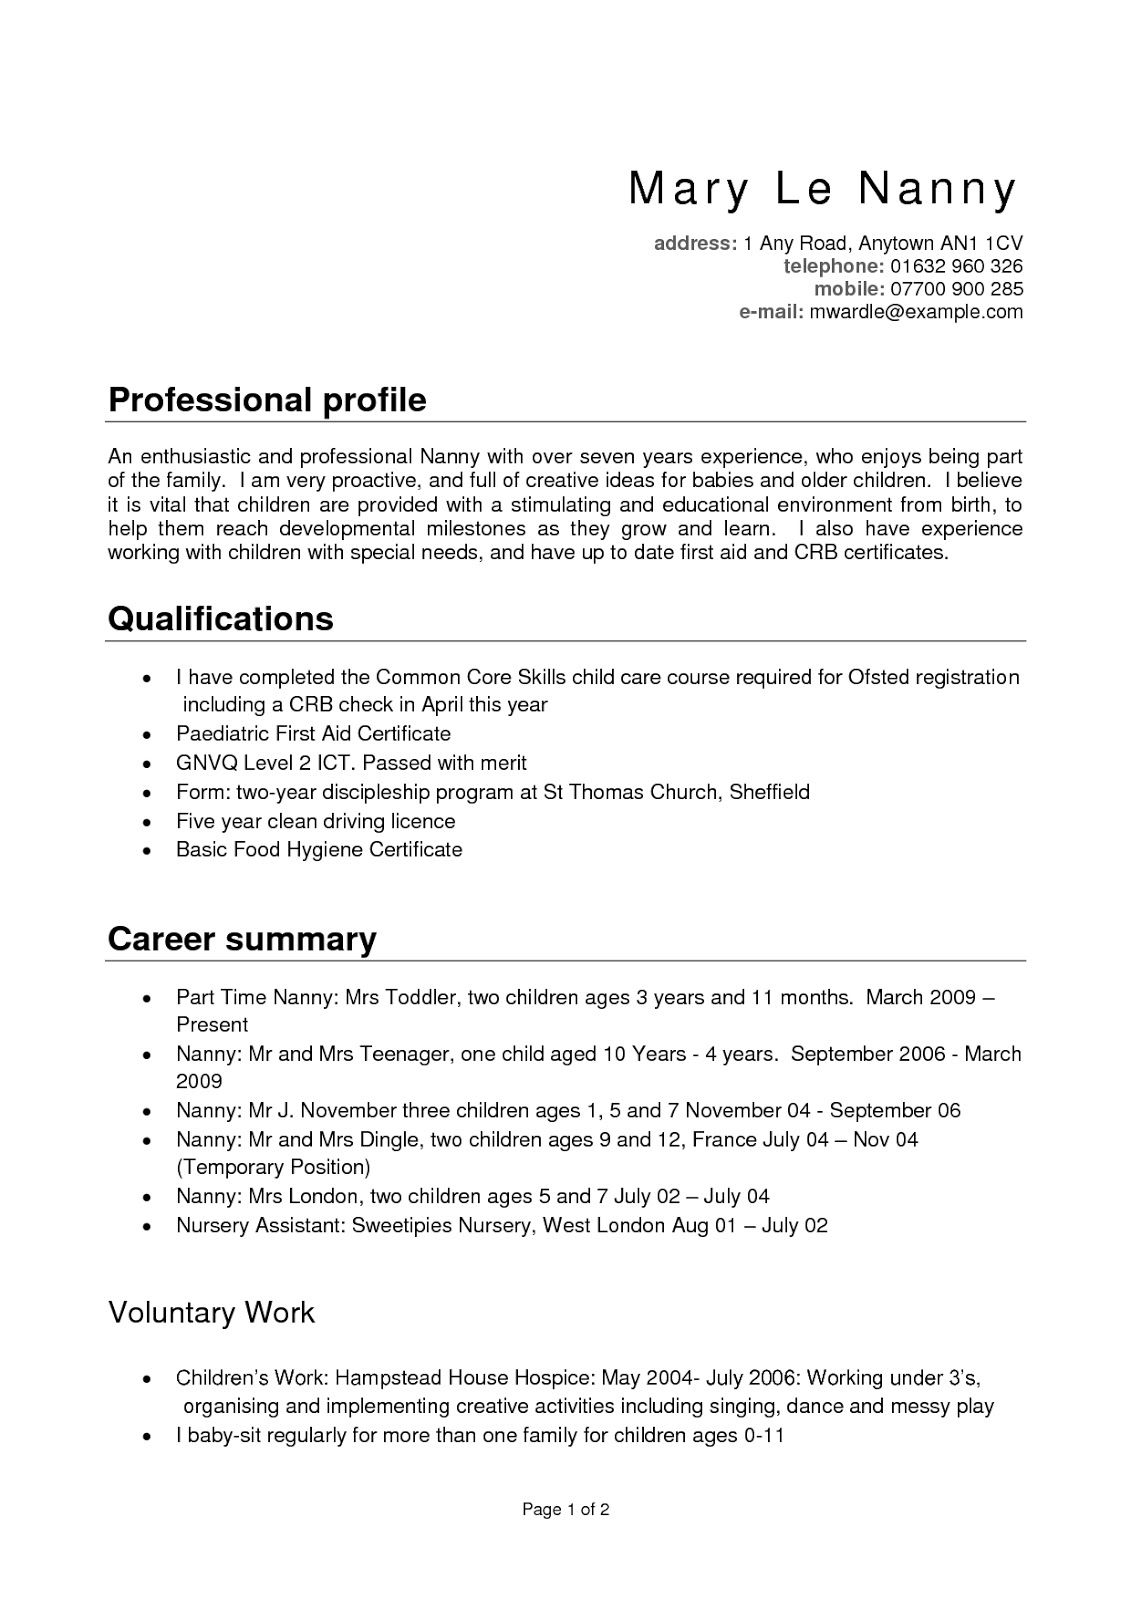 Nanny Resume Templates Nanny Resume Templates Free 2019 Nanny Resume Template Download 2019 Nanny Re Resume Profile Examples Resume Examples Resume Profile